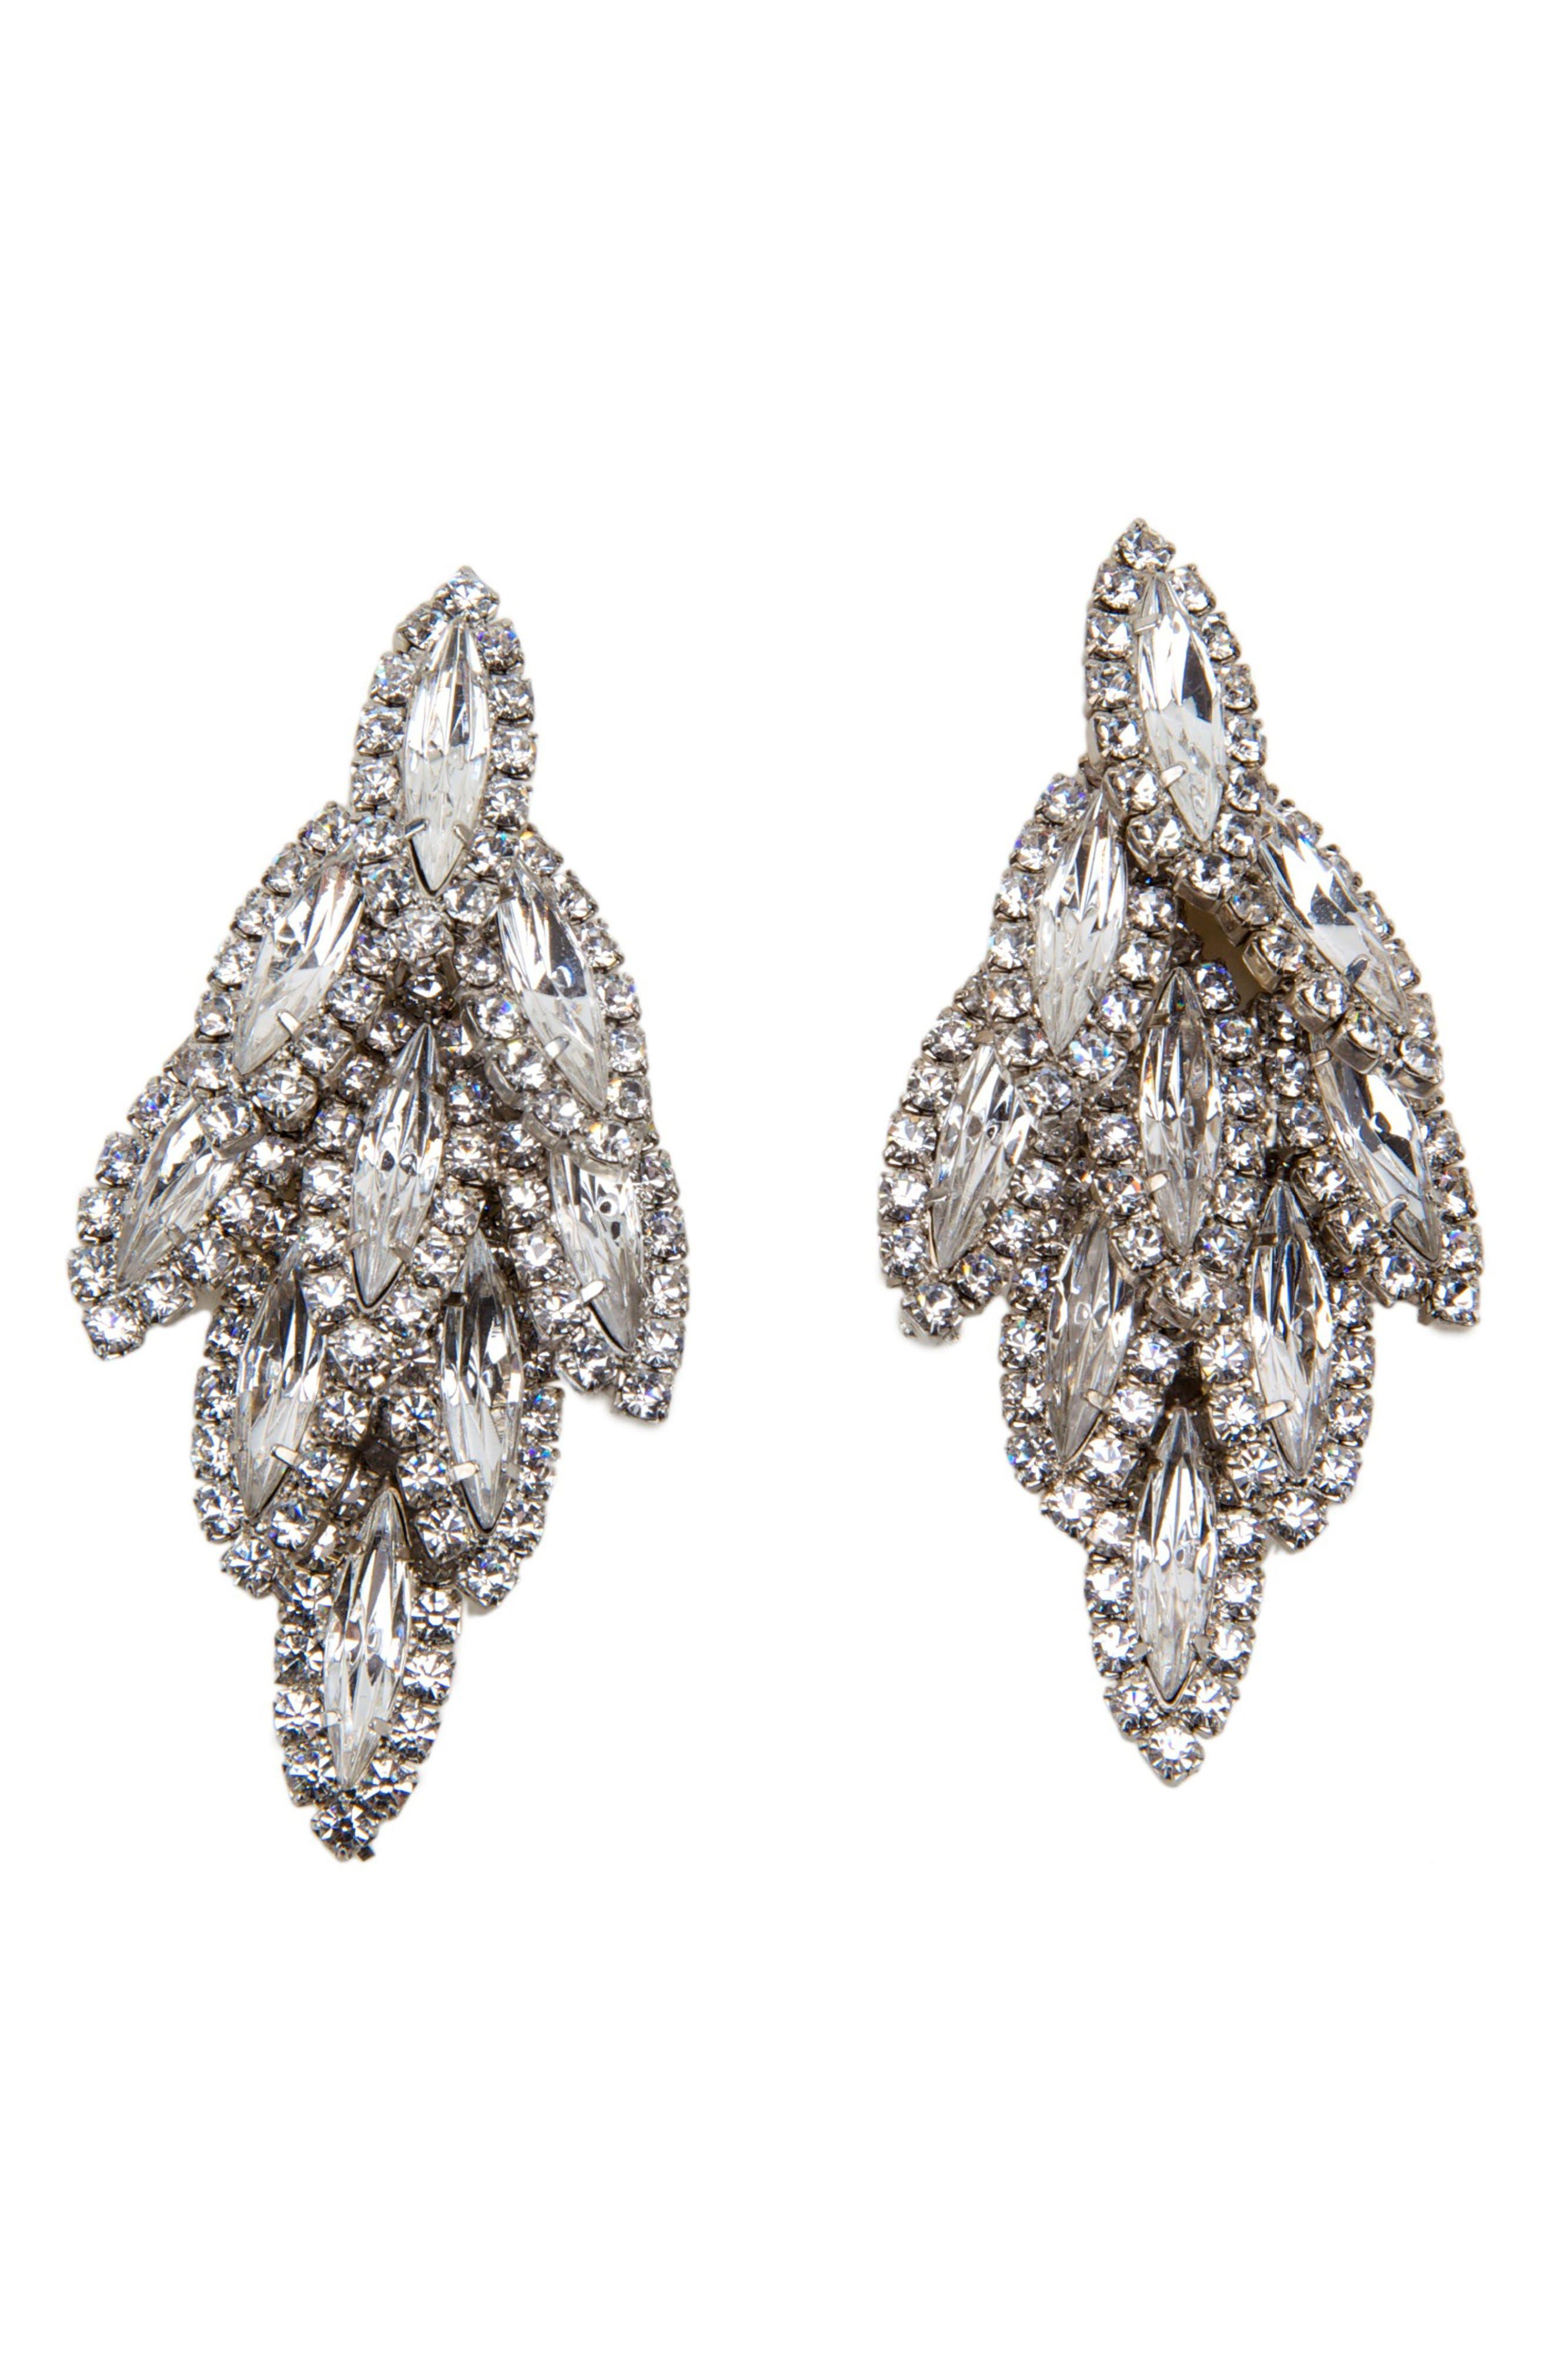 Alternate Image 1 Selected - Elizabeth Cole Bacall Crystal Drop Earrings